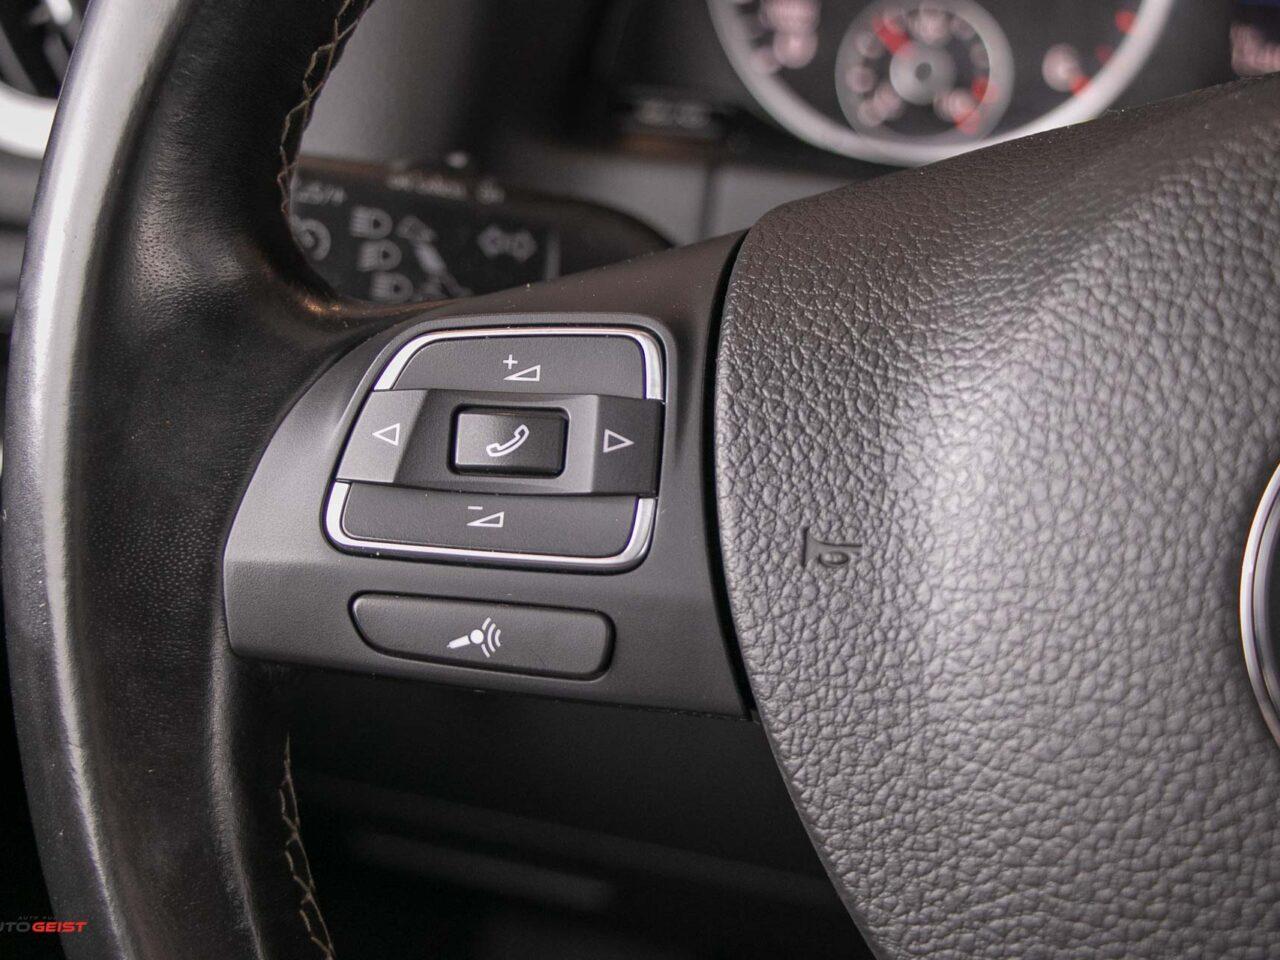 VW-TIGUAN-2015-manual-3476